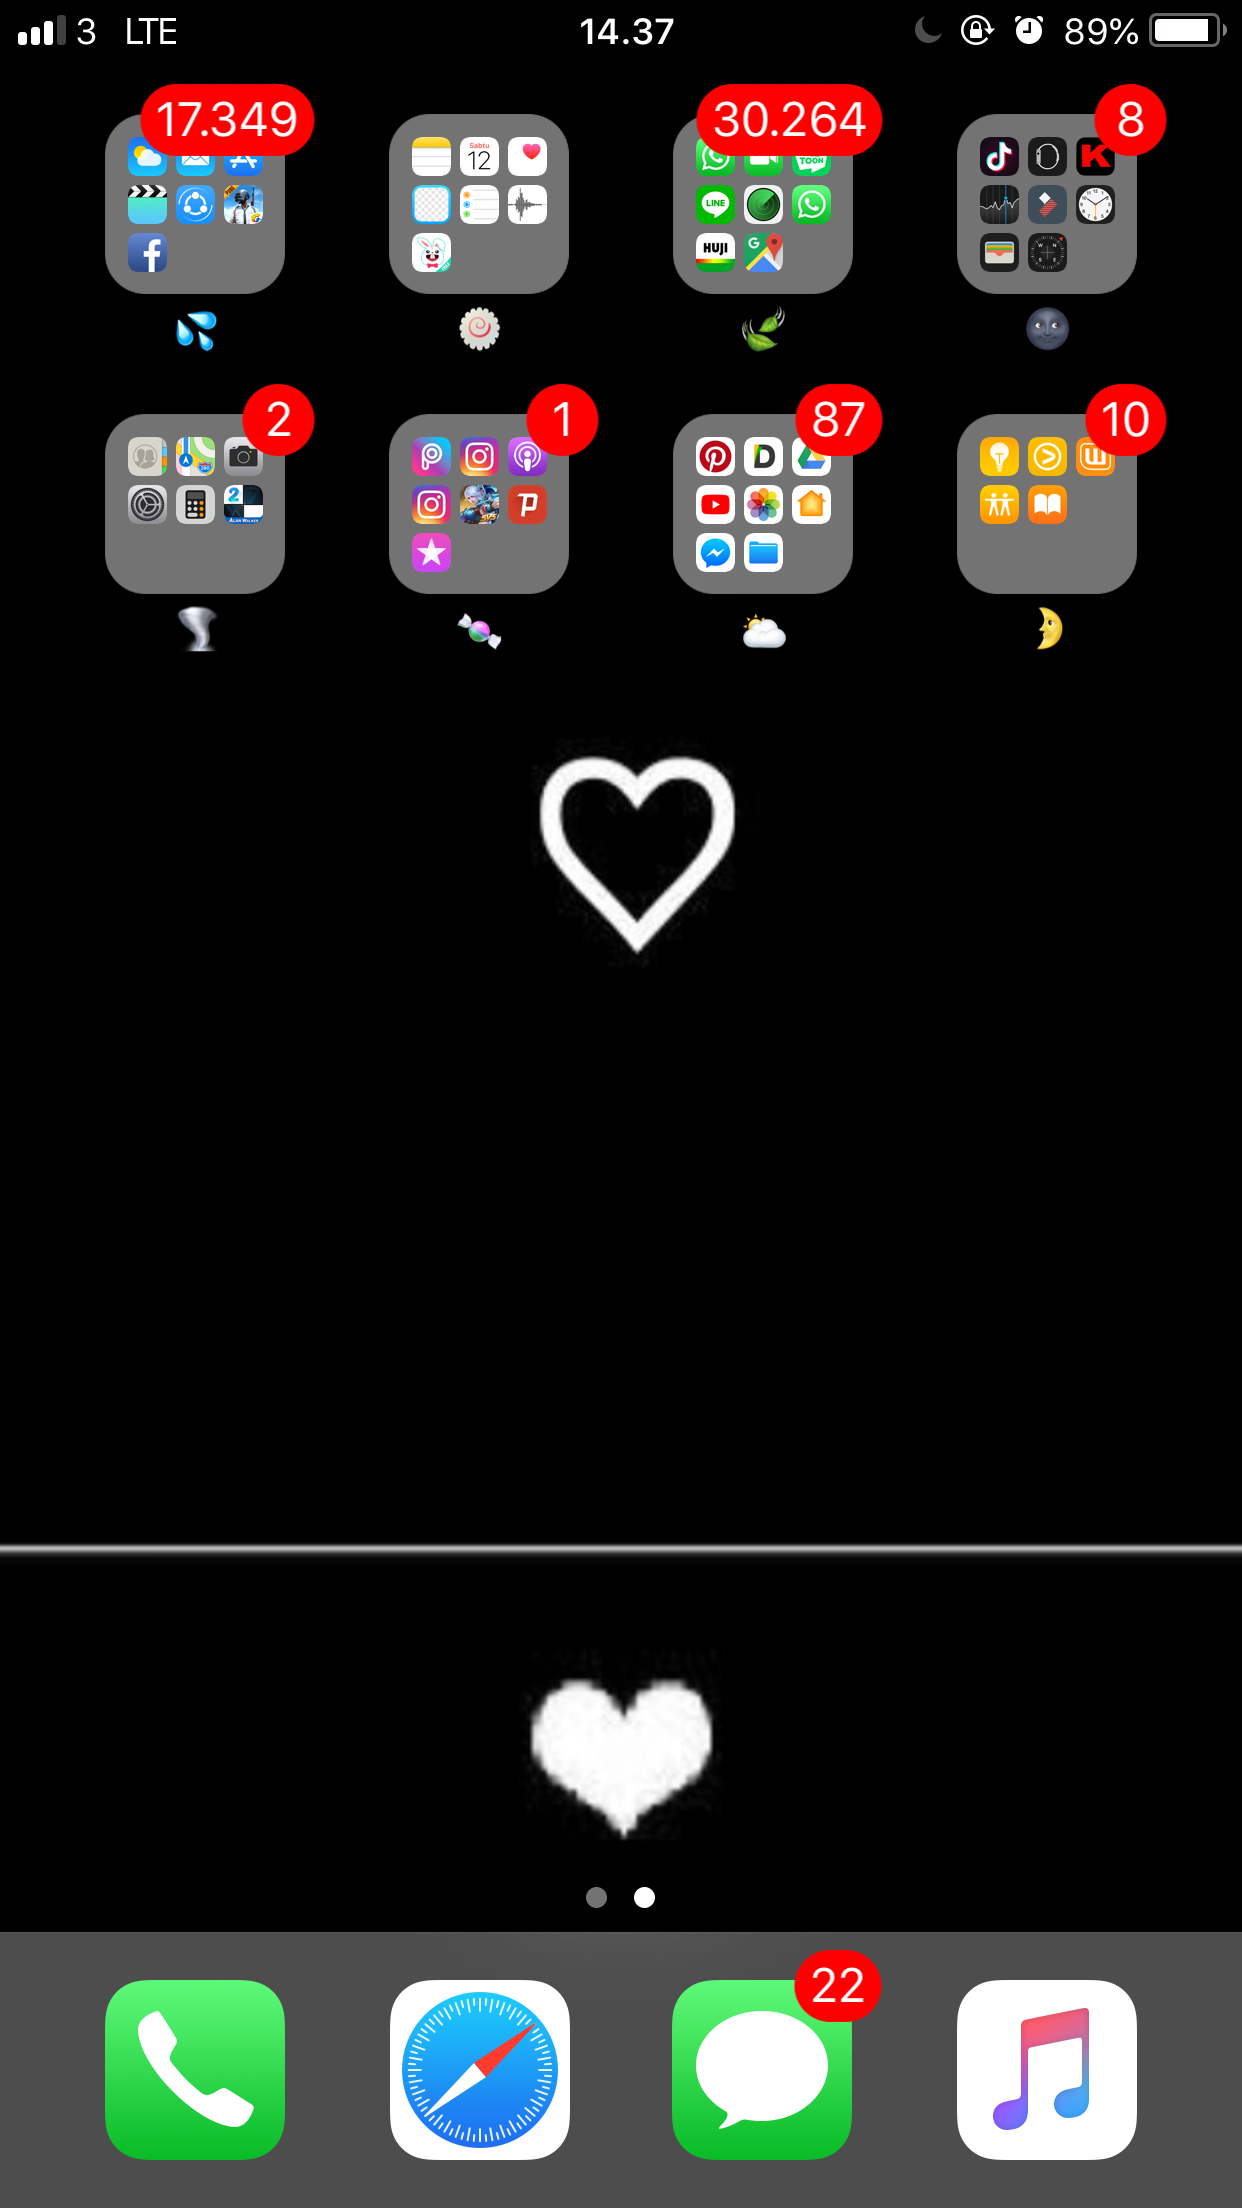 Wpeaqeaq Iphone organization, Iphone layout, Homescreen